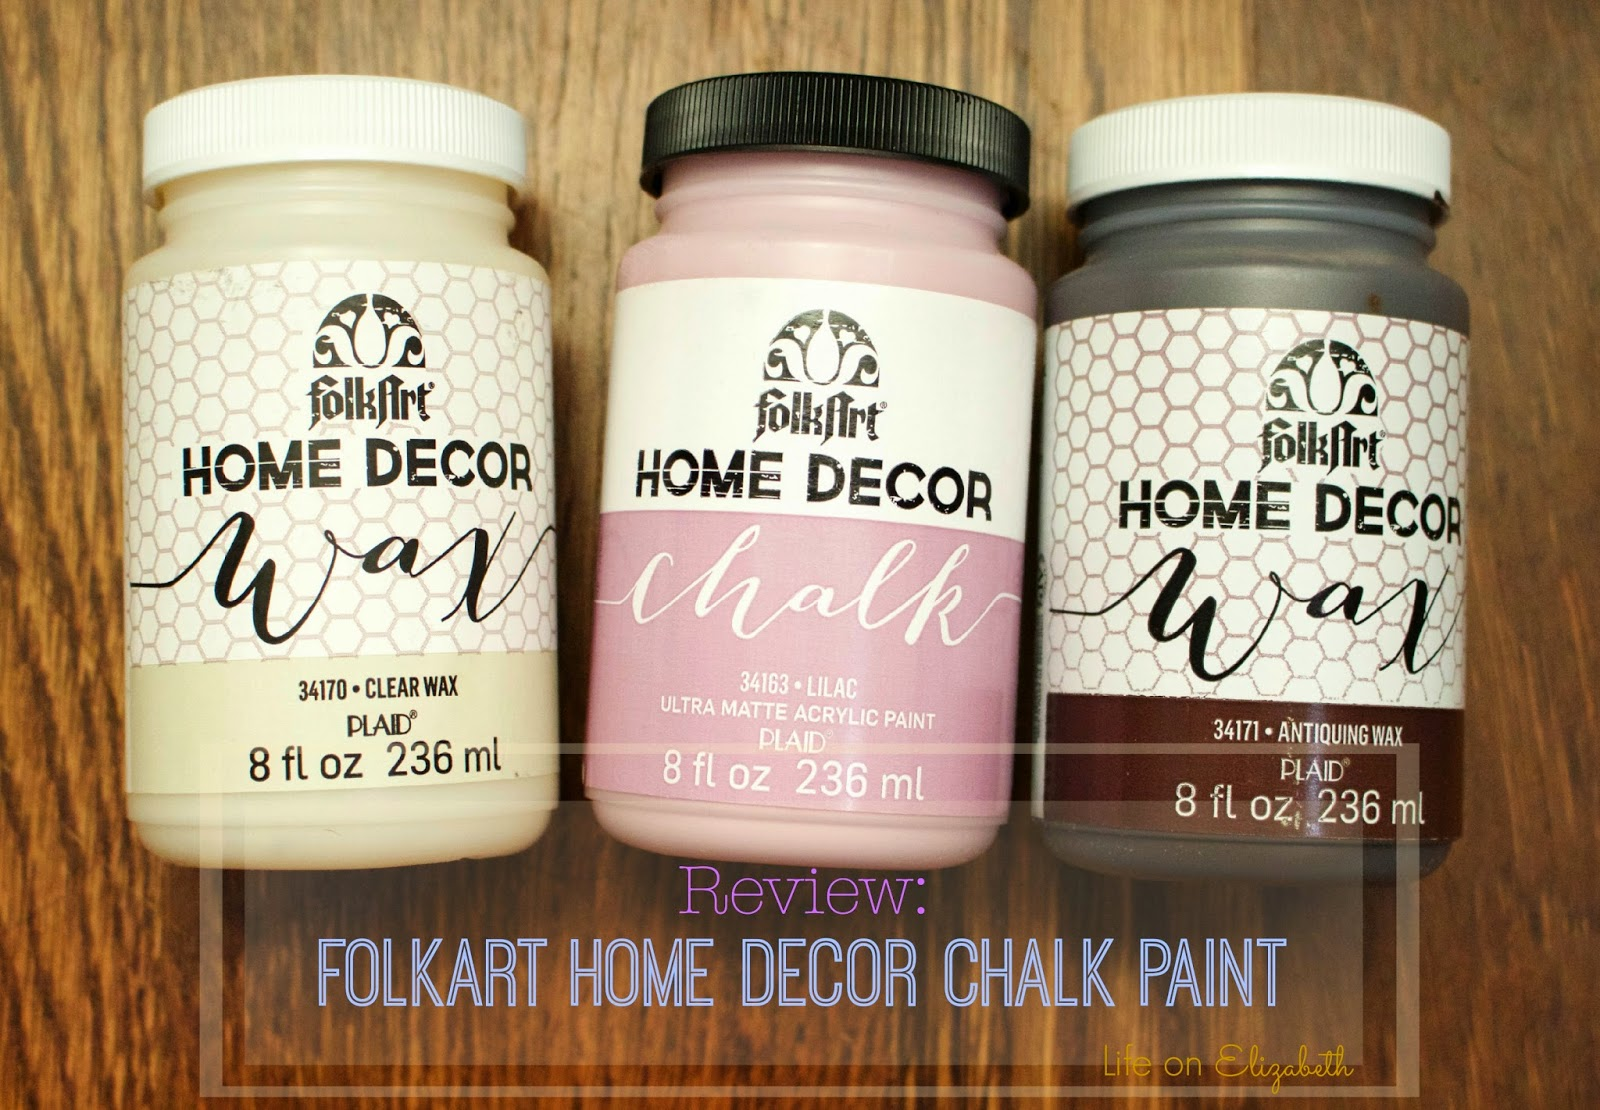 Life On Elizabeth: 'FolkArt Home Decor Chalk' Paint Review